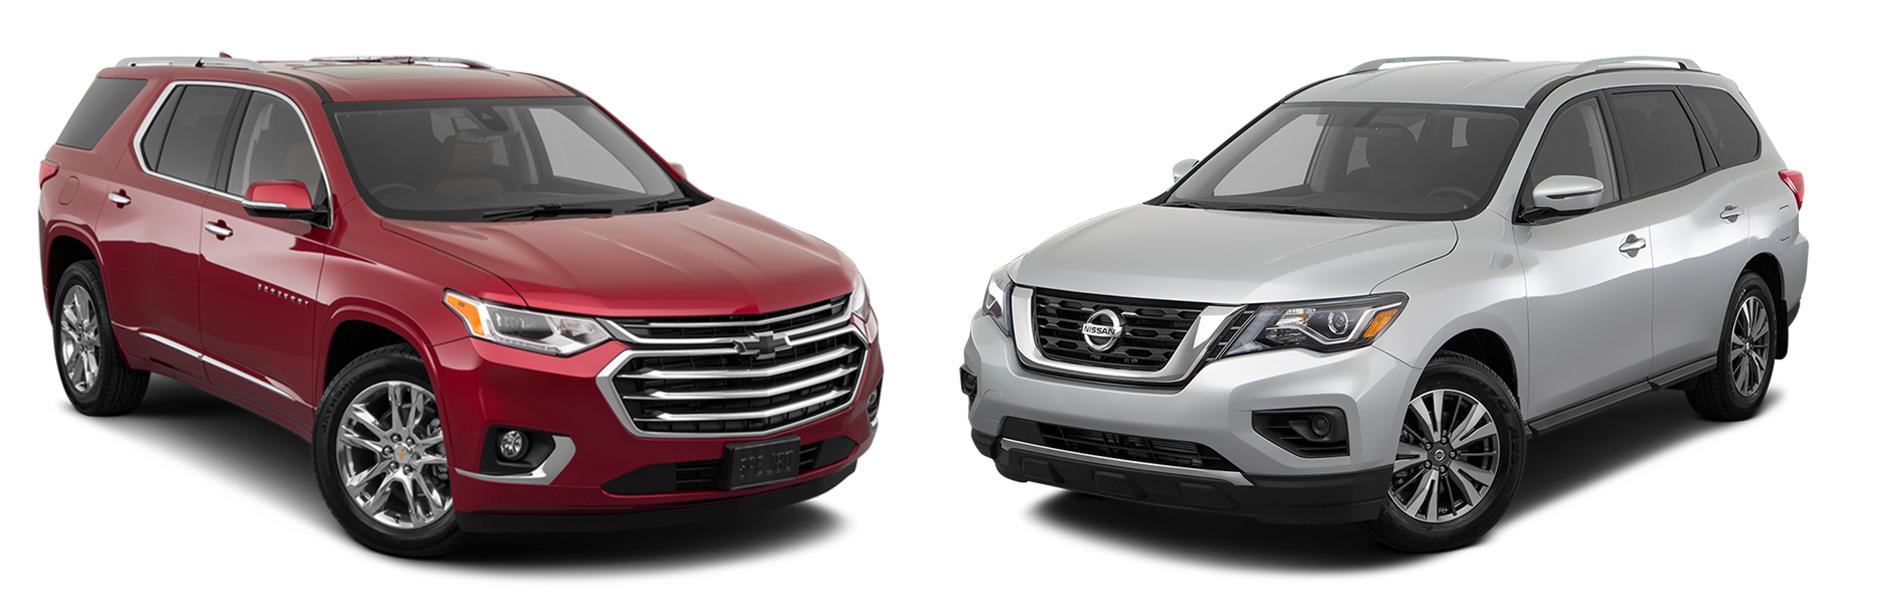 Nissan Pathfinder vs Traverse